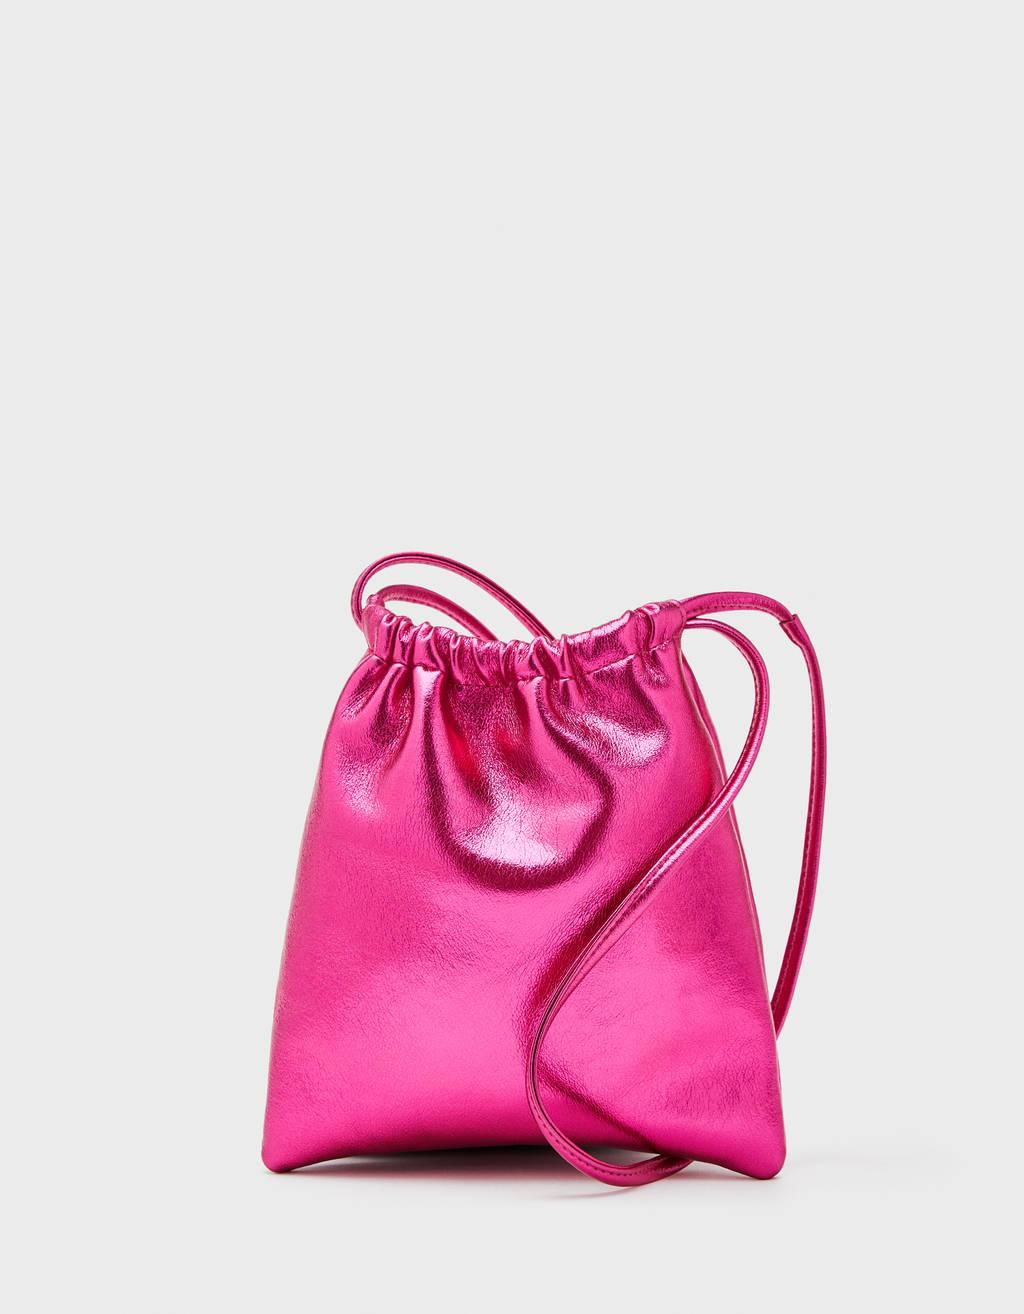 Metallic pouch-style bag